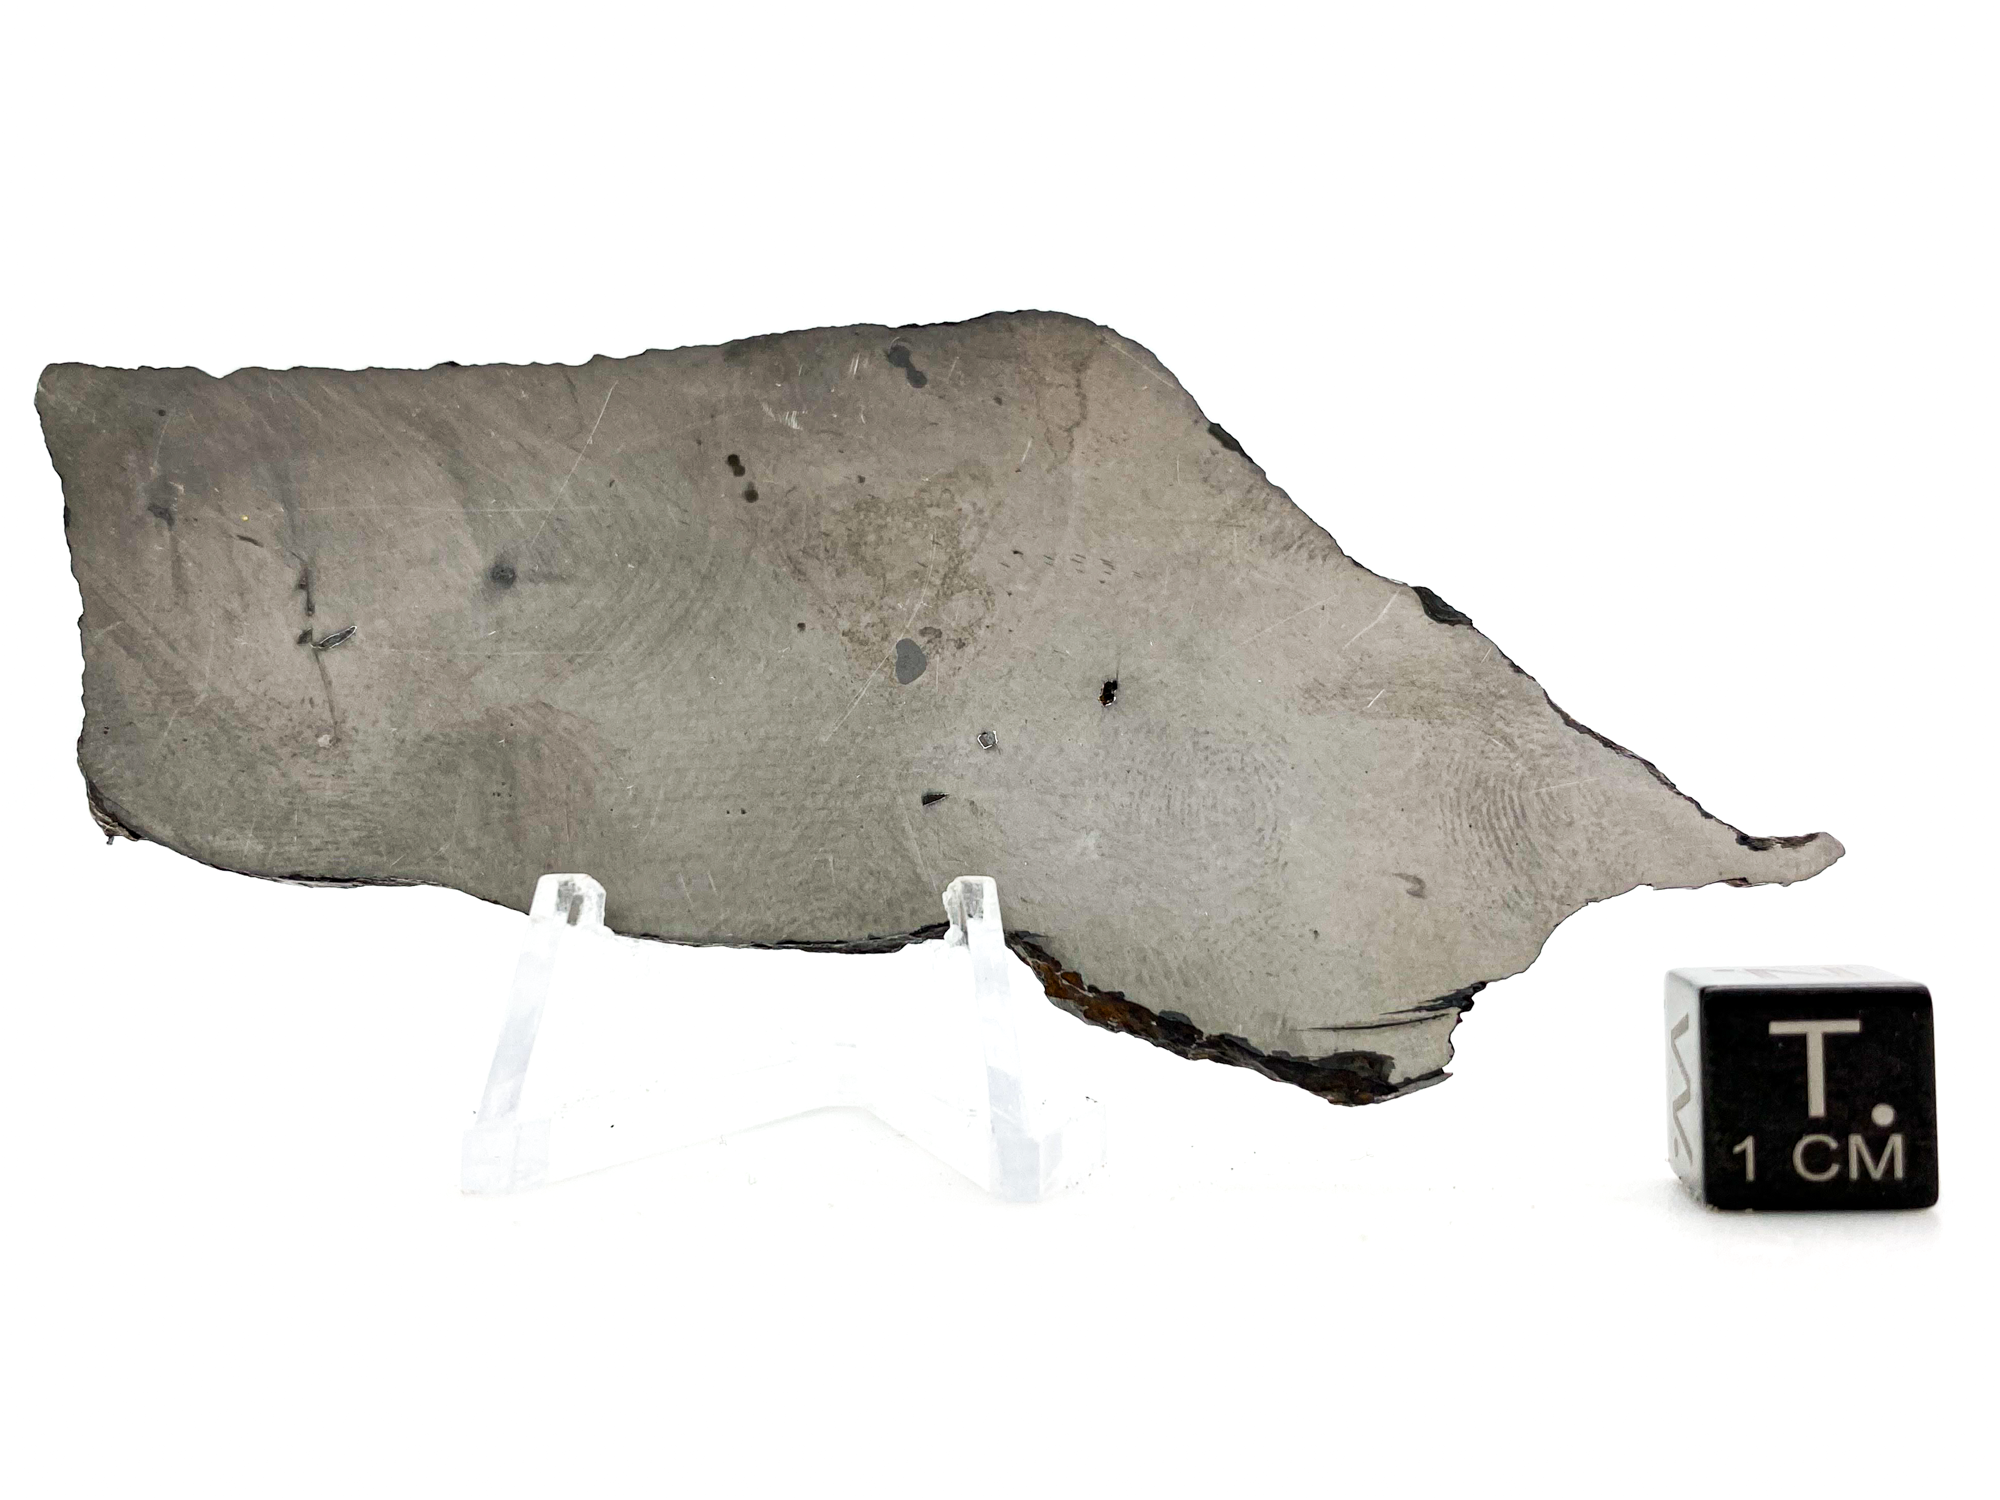 chinga iron meteorite 55 grams